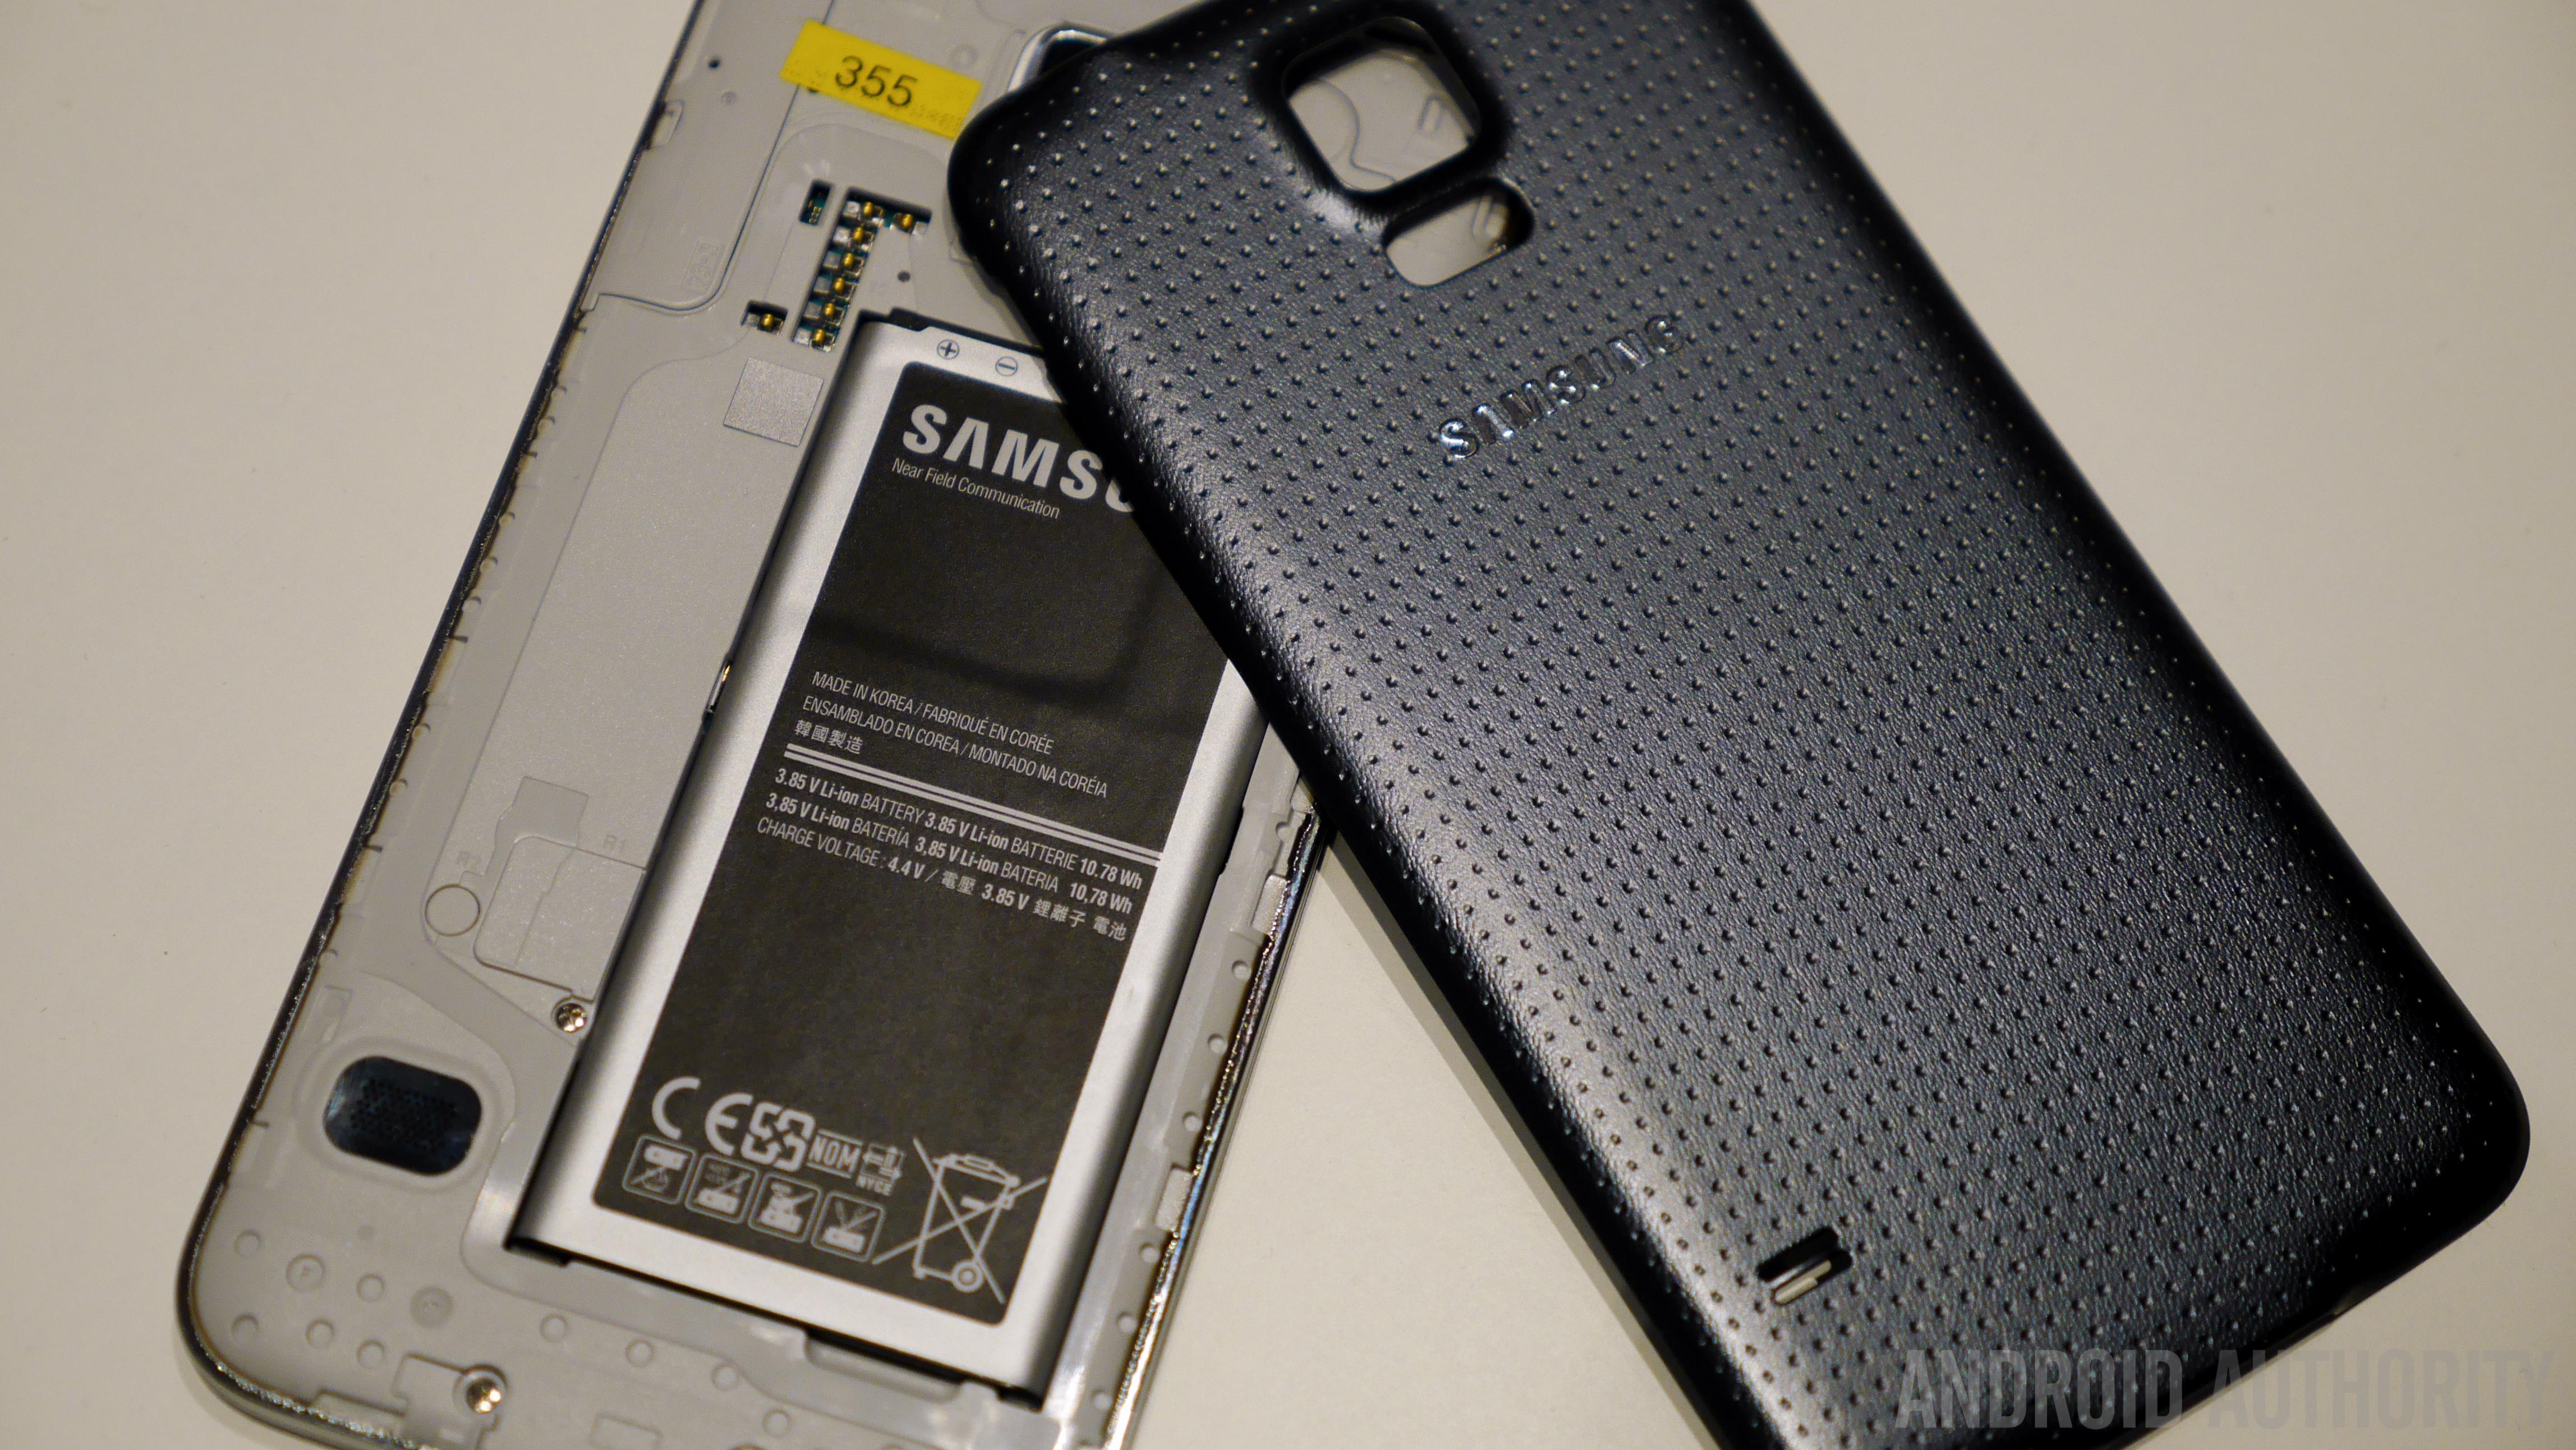 Samsung Galaxy S5 Hands on MWC 2014-1160075